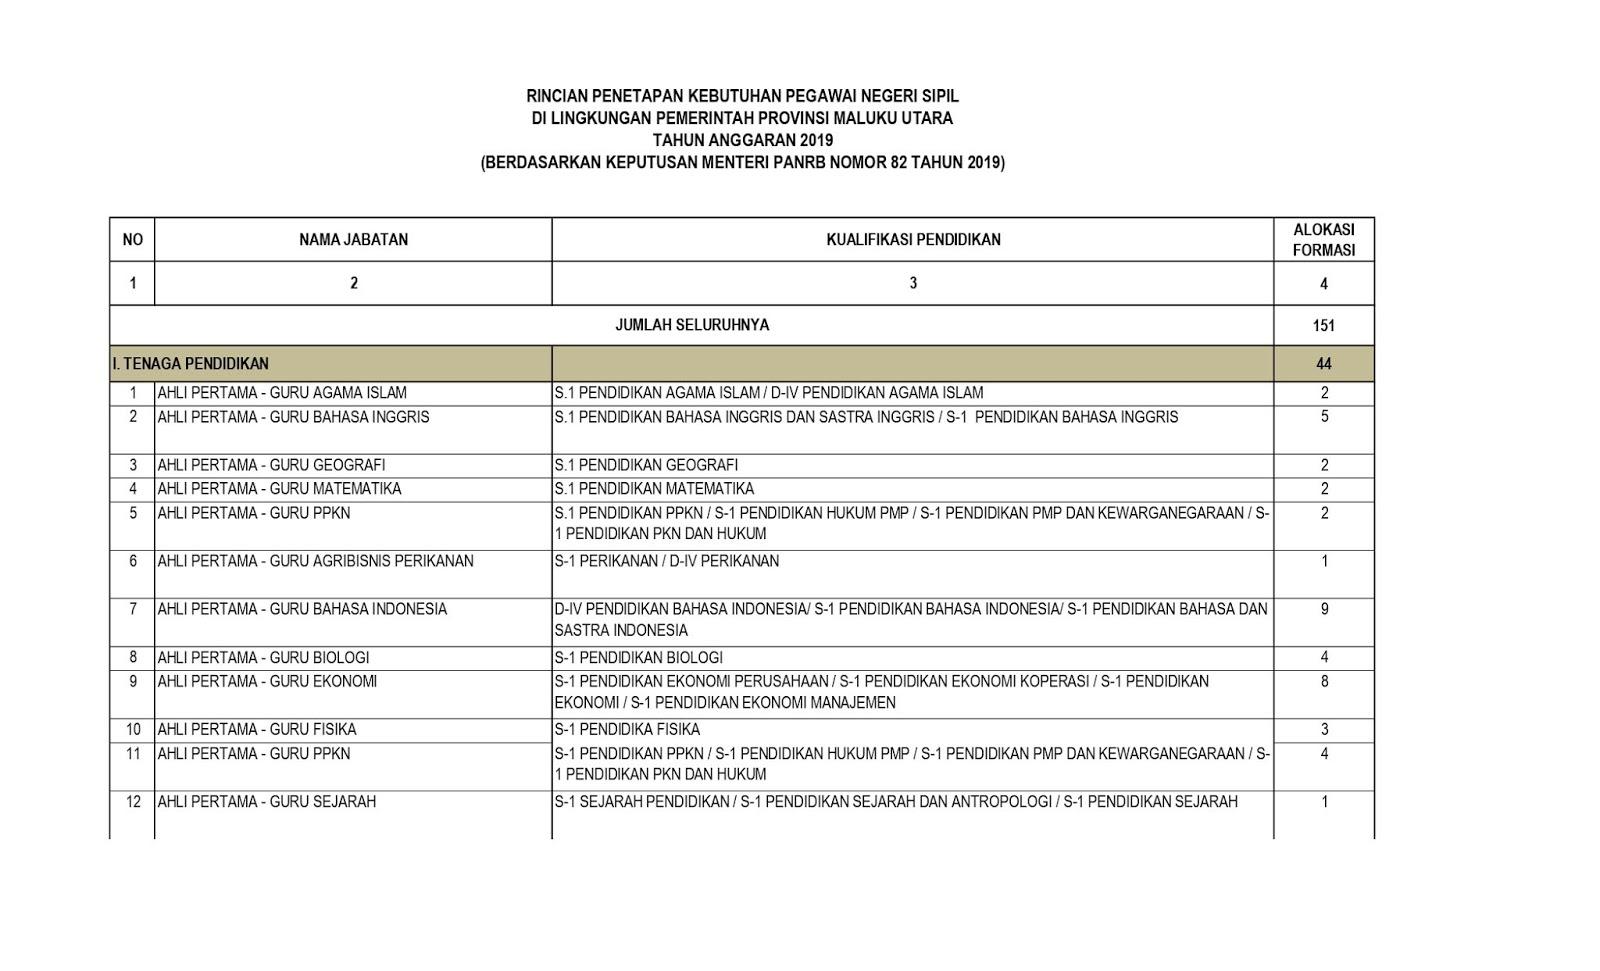 Download Formasi CPNS Provinsi Maluku Utara tahun 2019